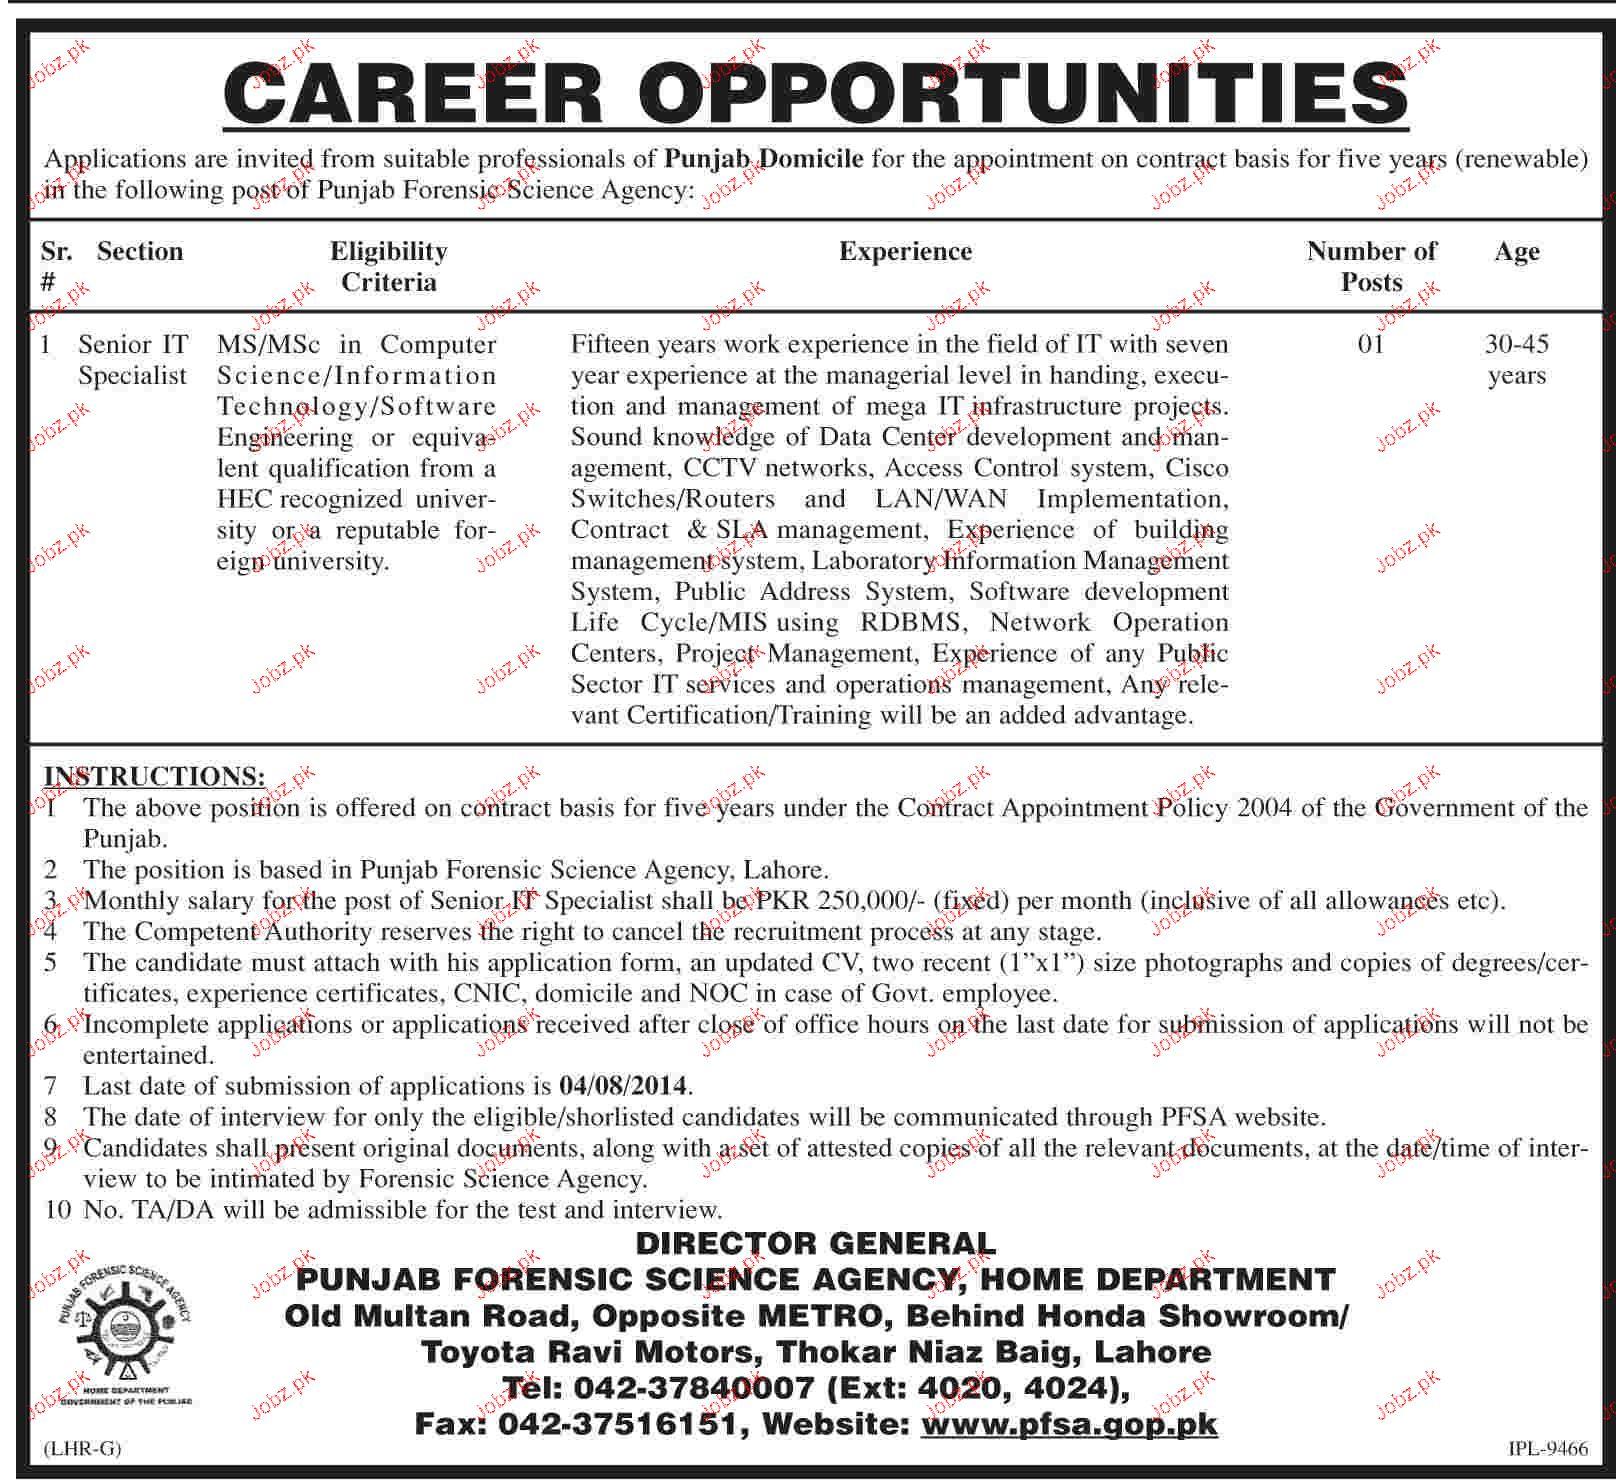 Senior IT Specialist Job in Punjab Forensic Science Agency